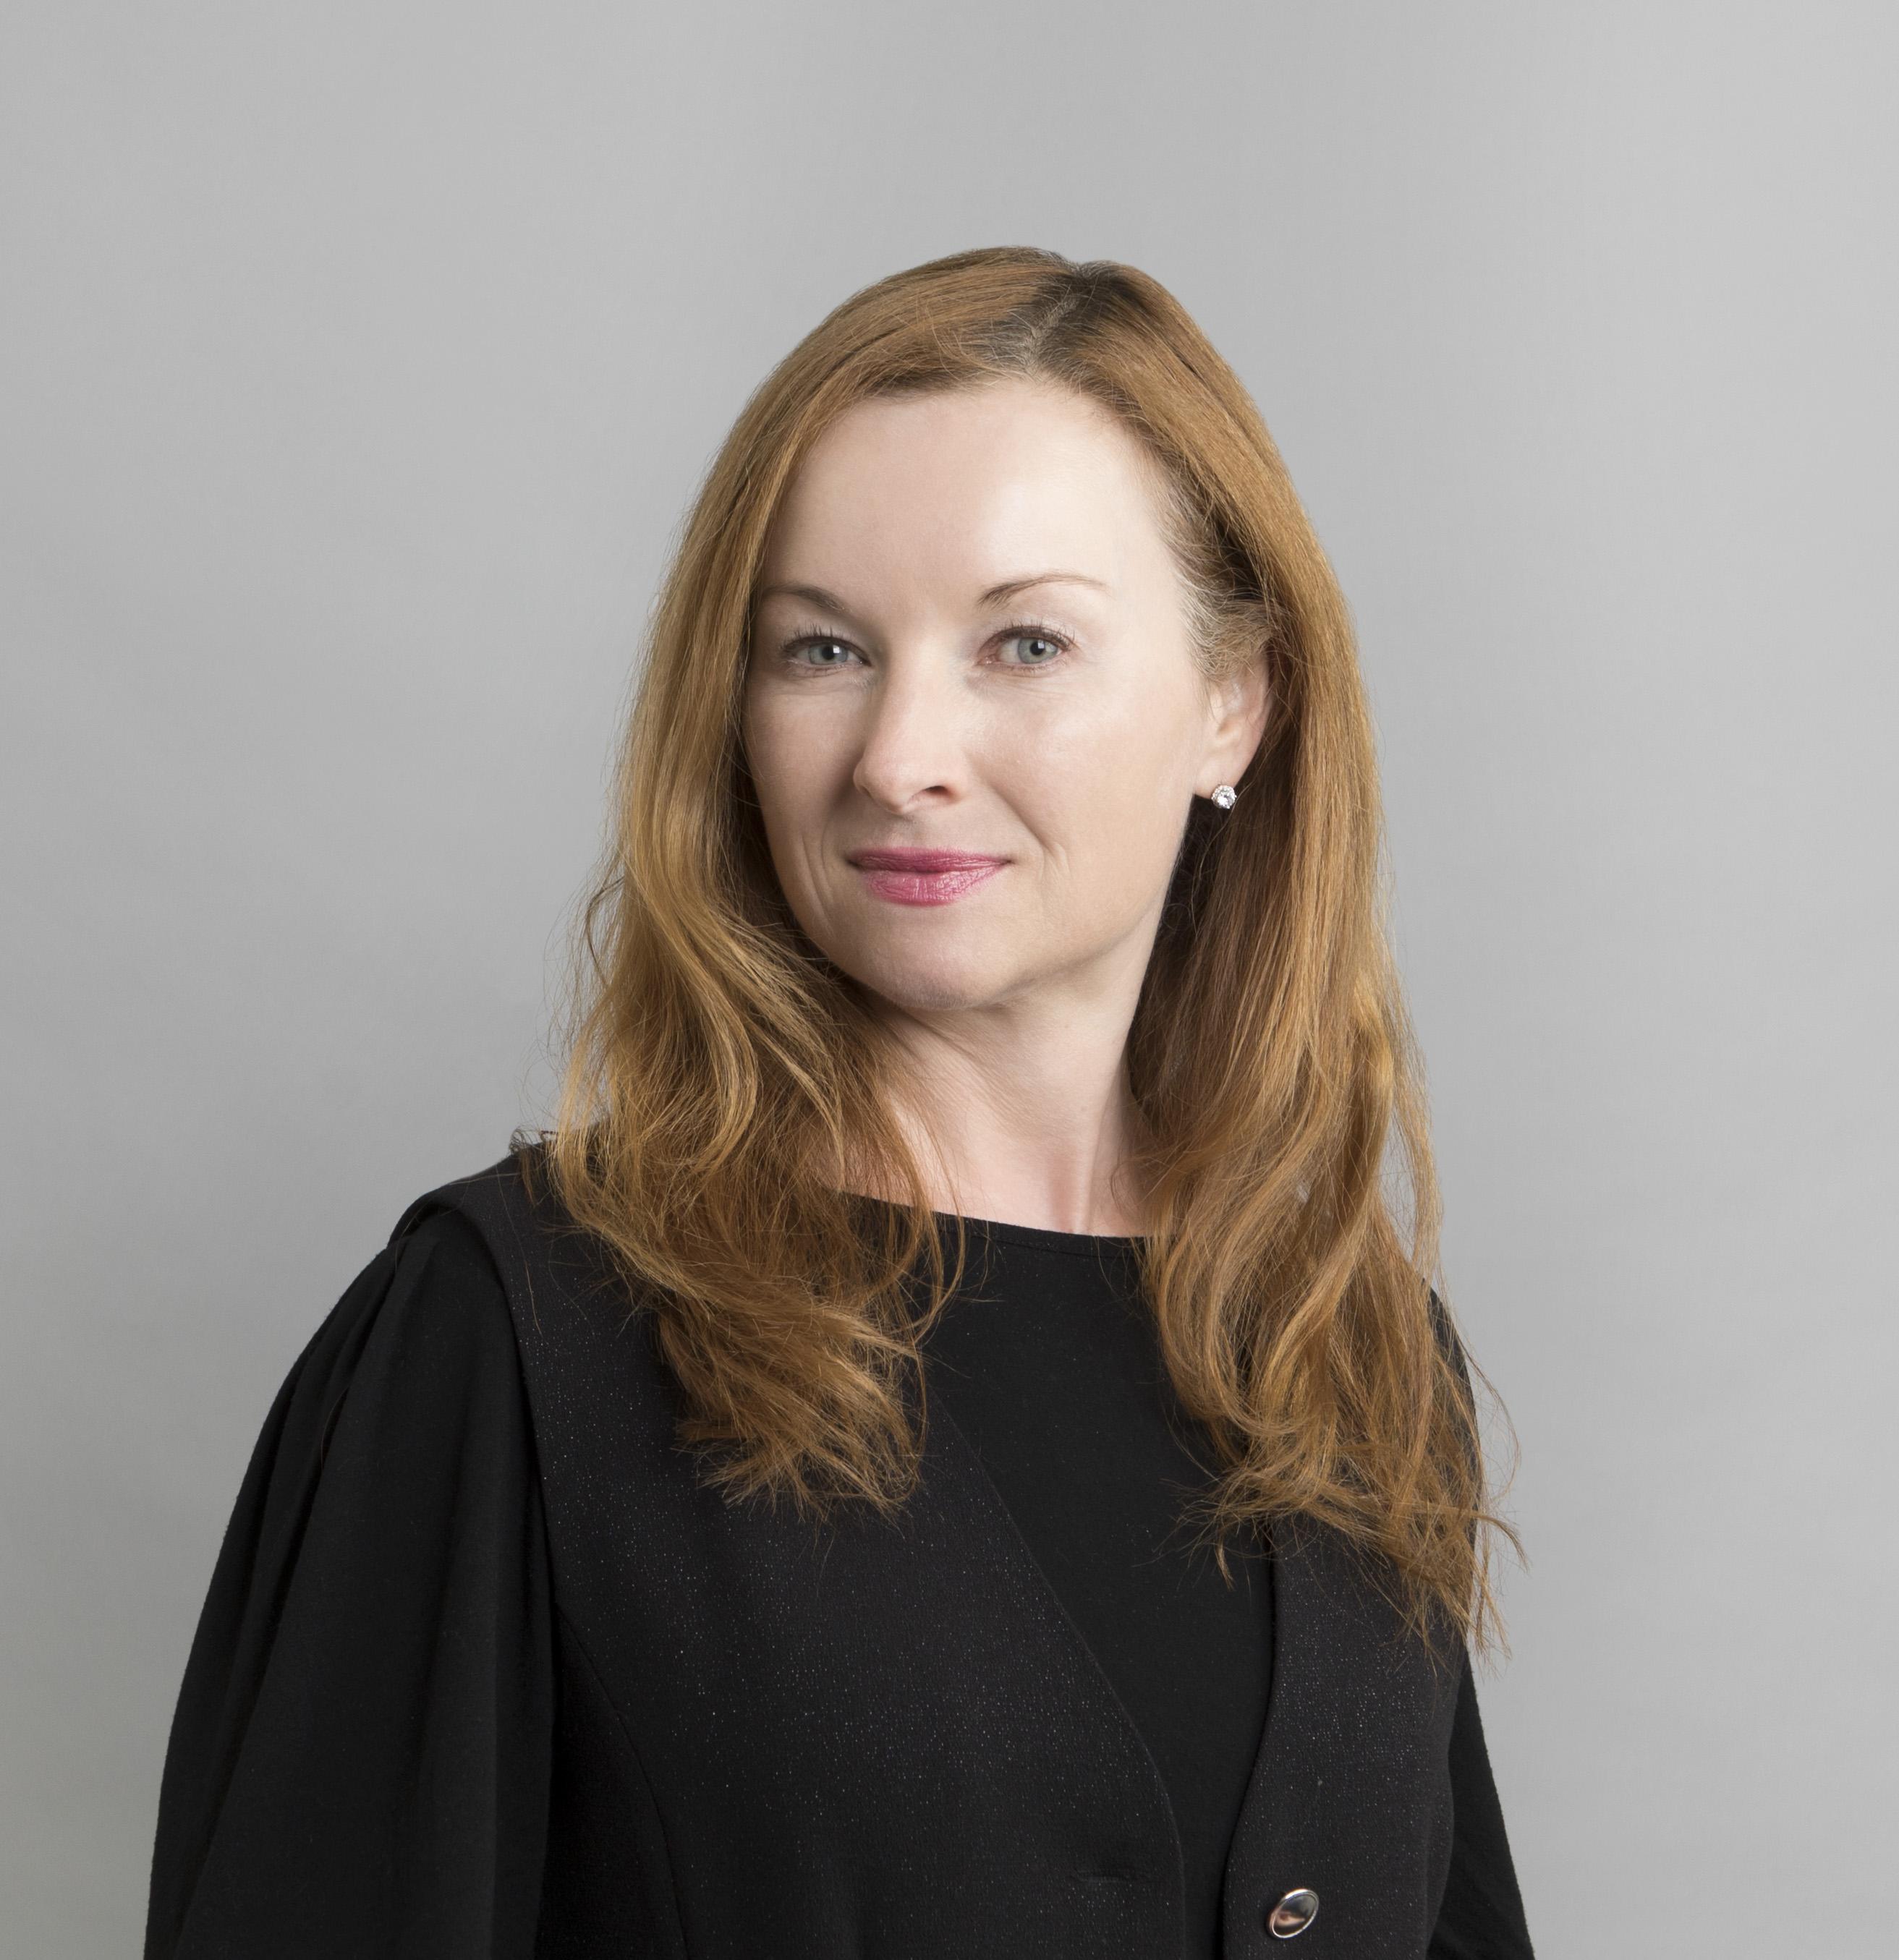 Nicole McNeill headshot